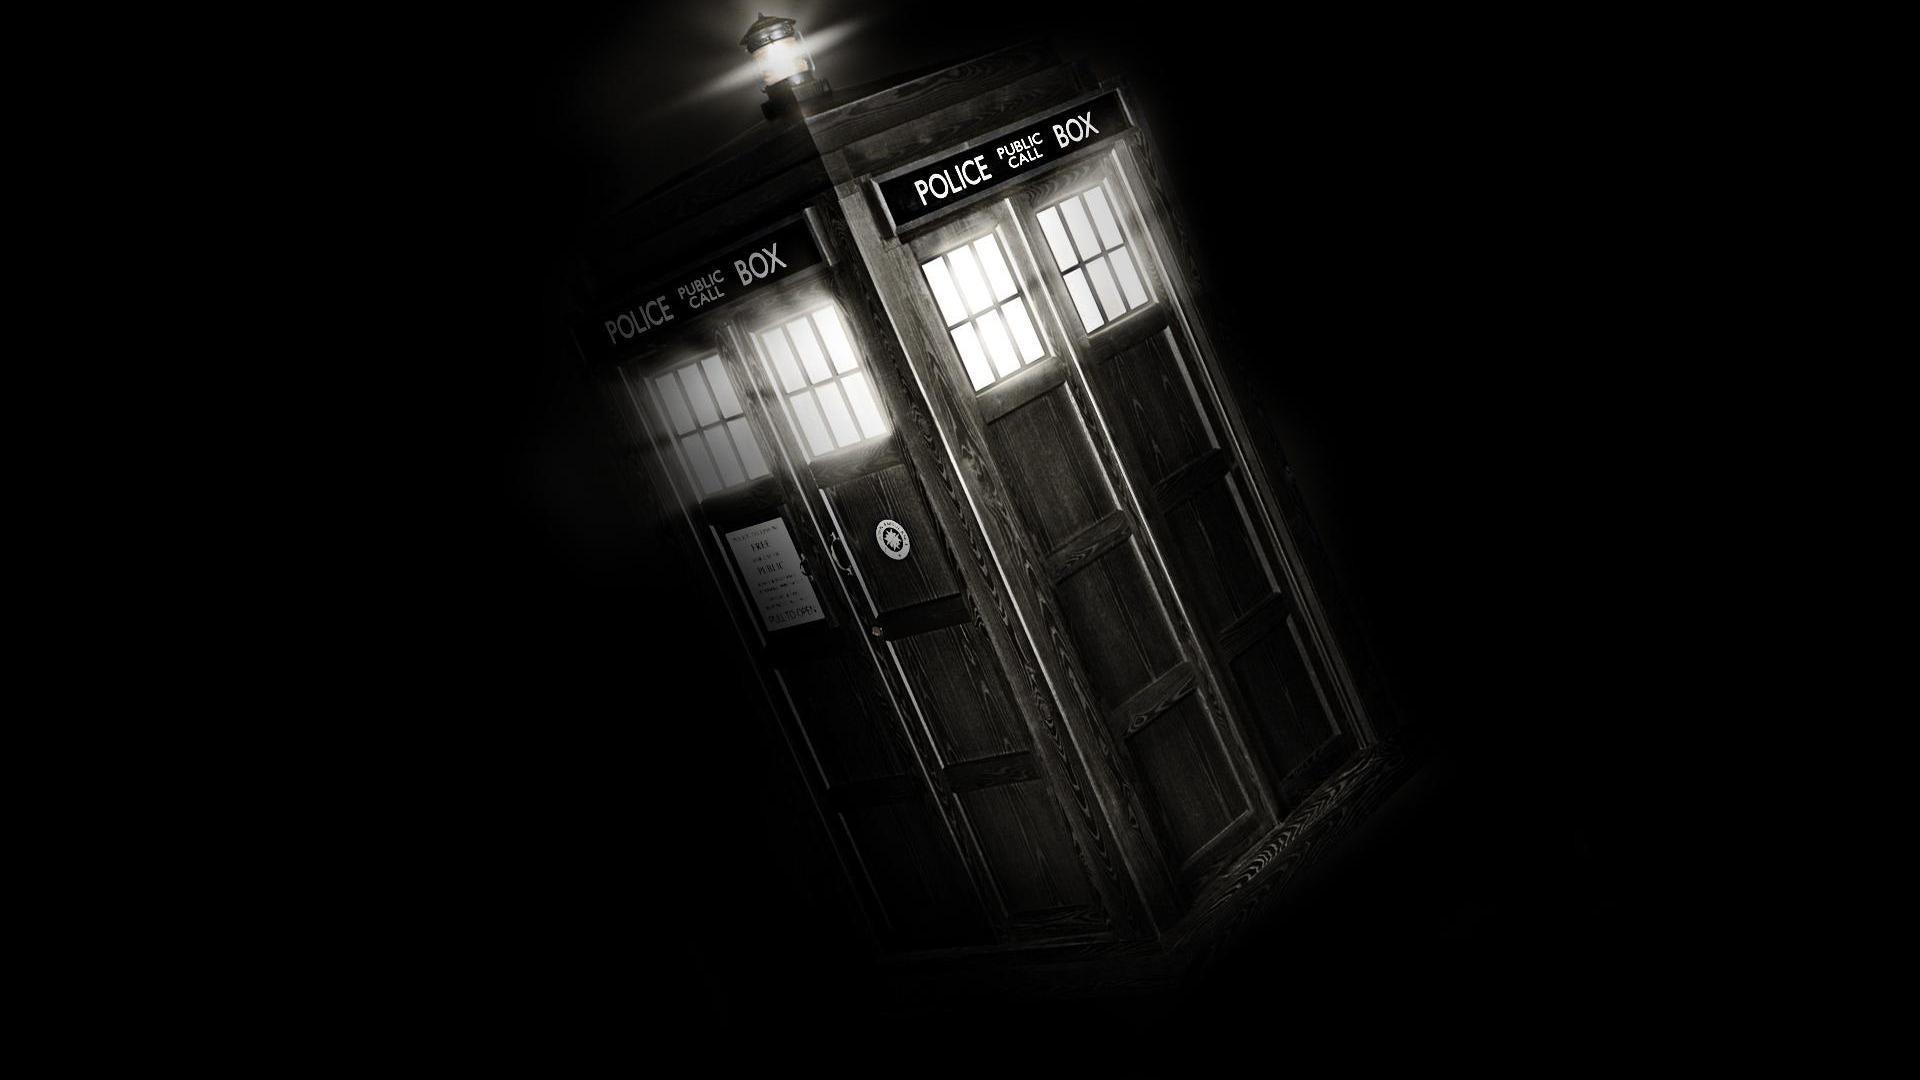 Doctor Who Tardis TV TARDIS Shows HD Wallpapers, Desktop .